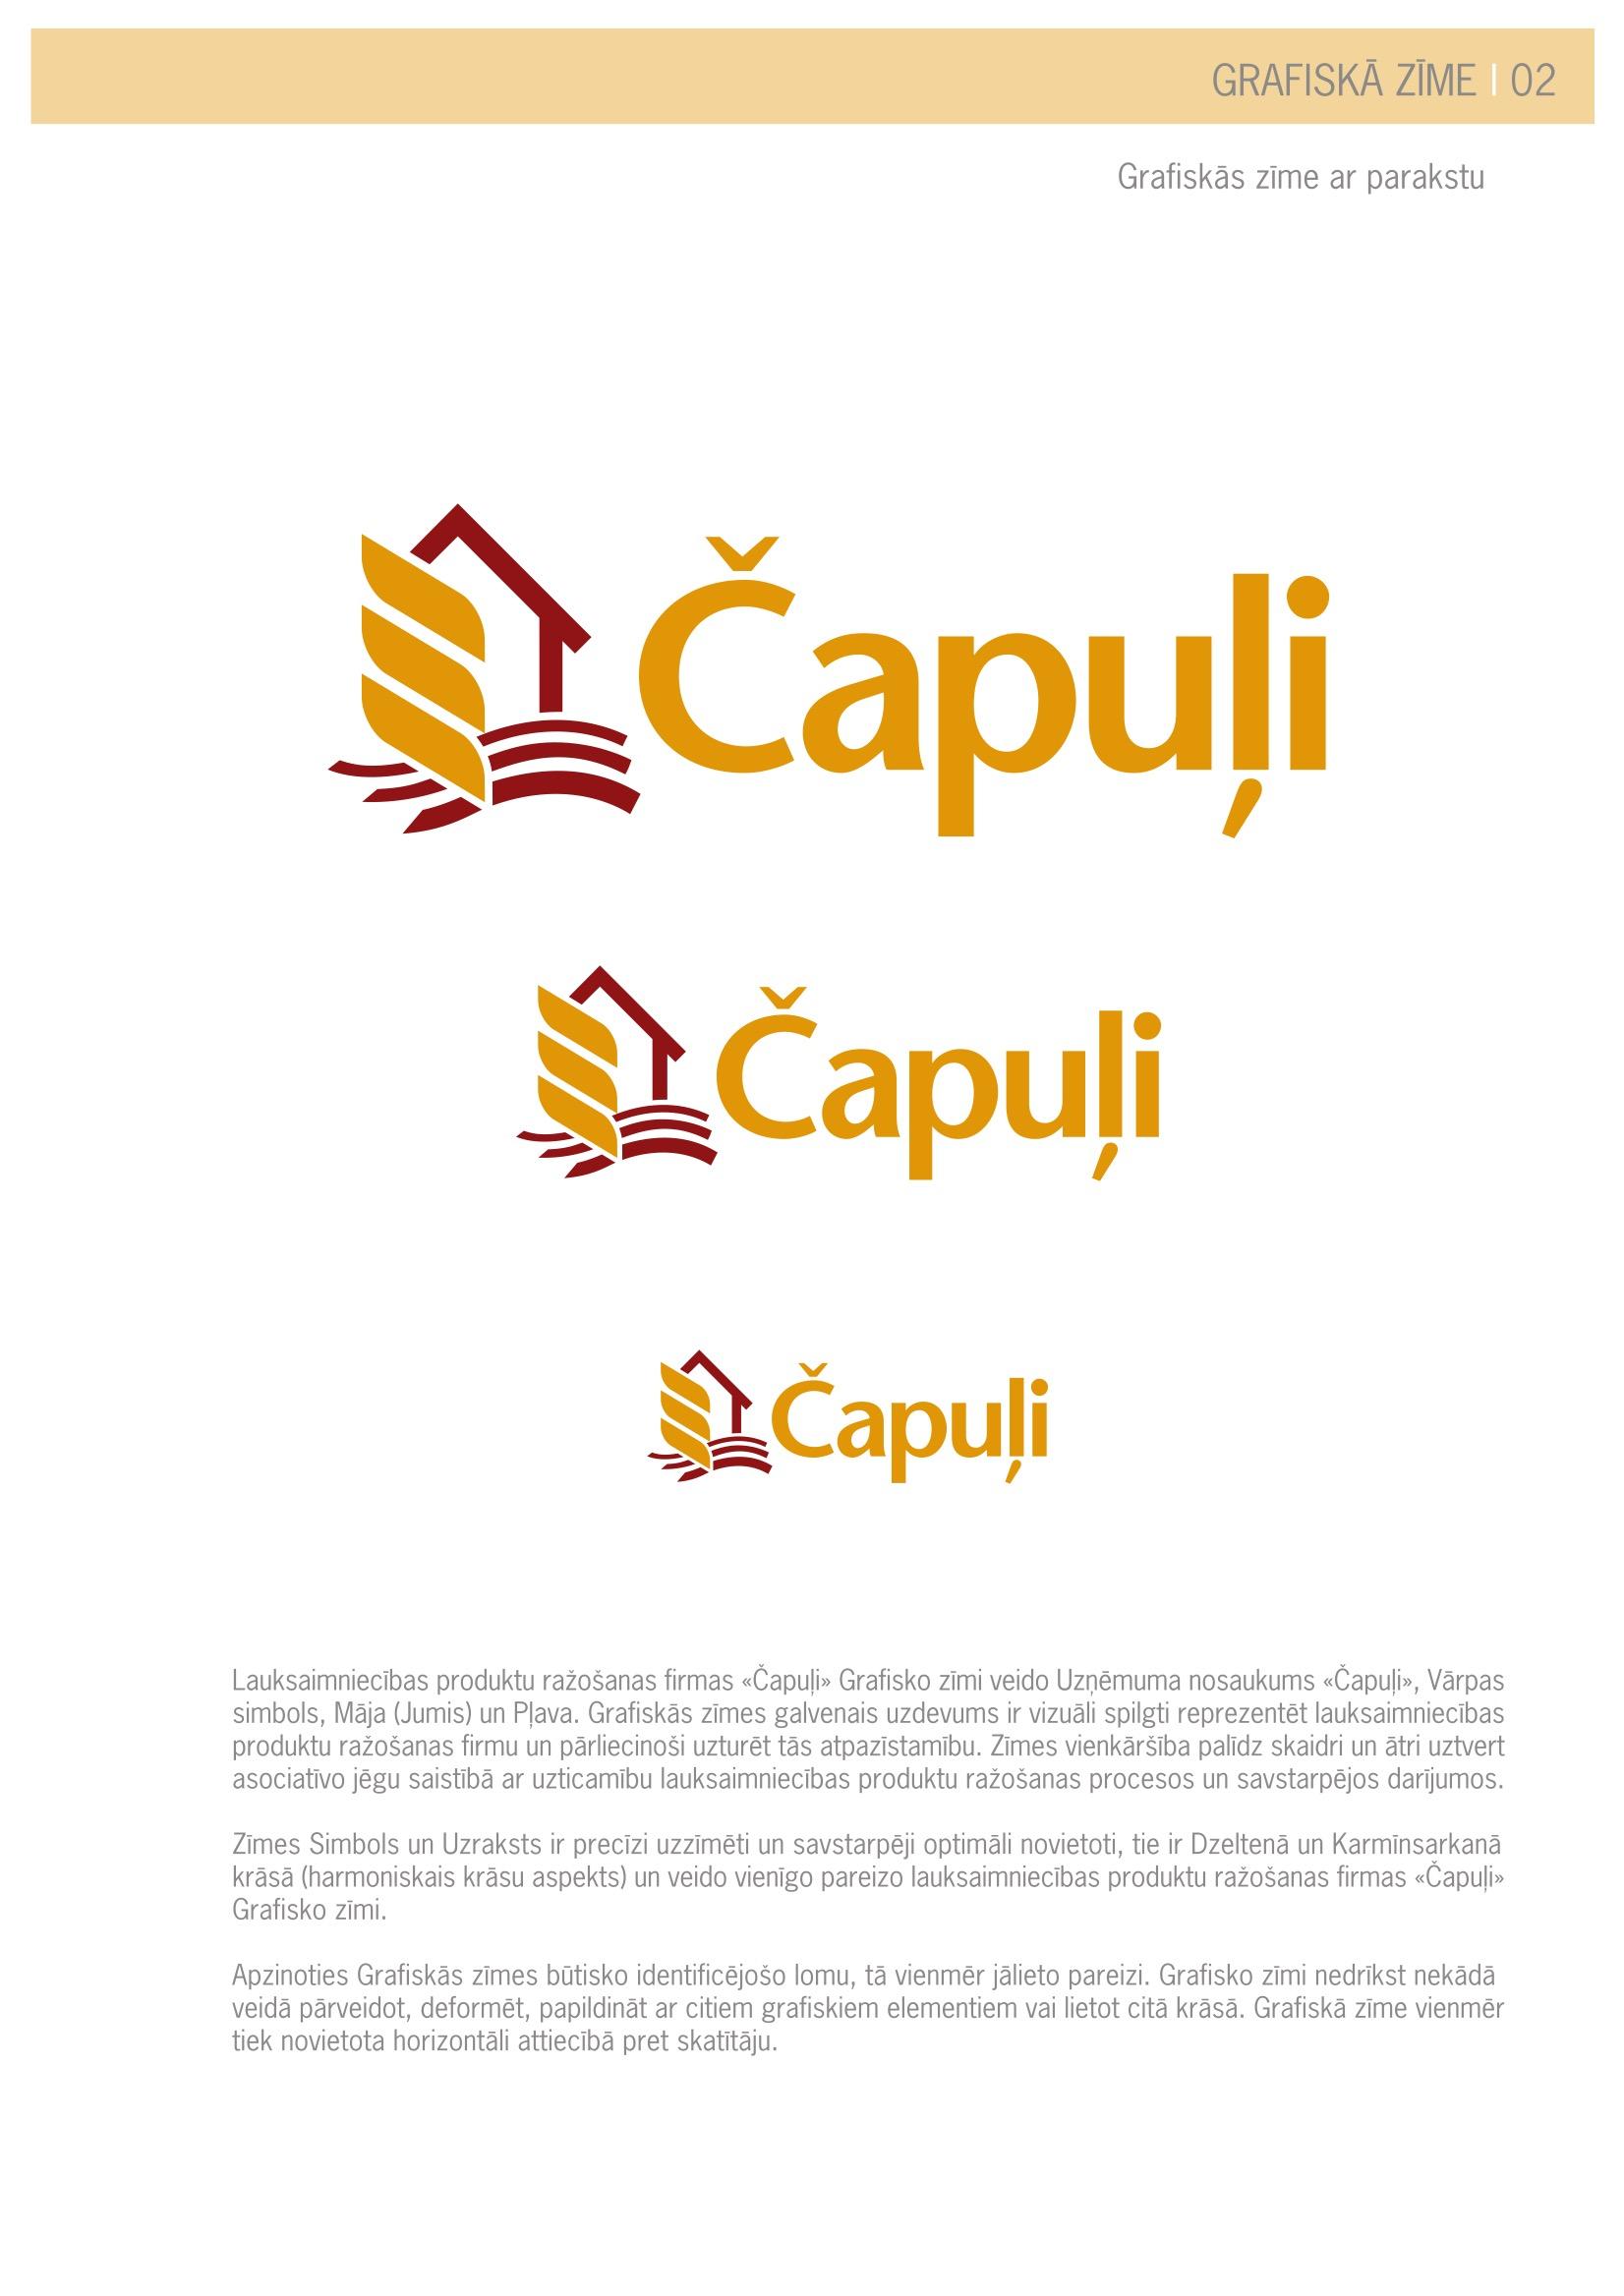 Chapulji_Stils 2